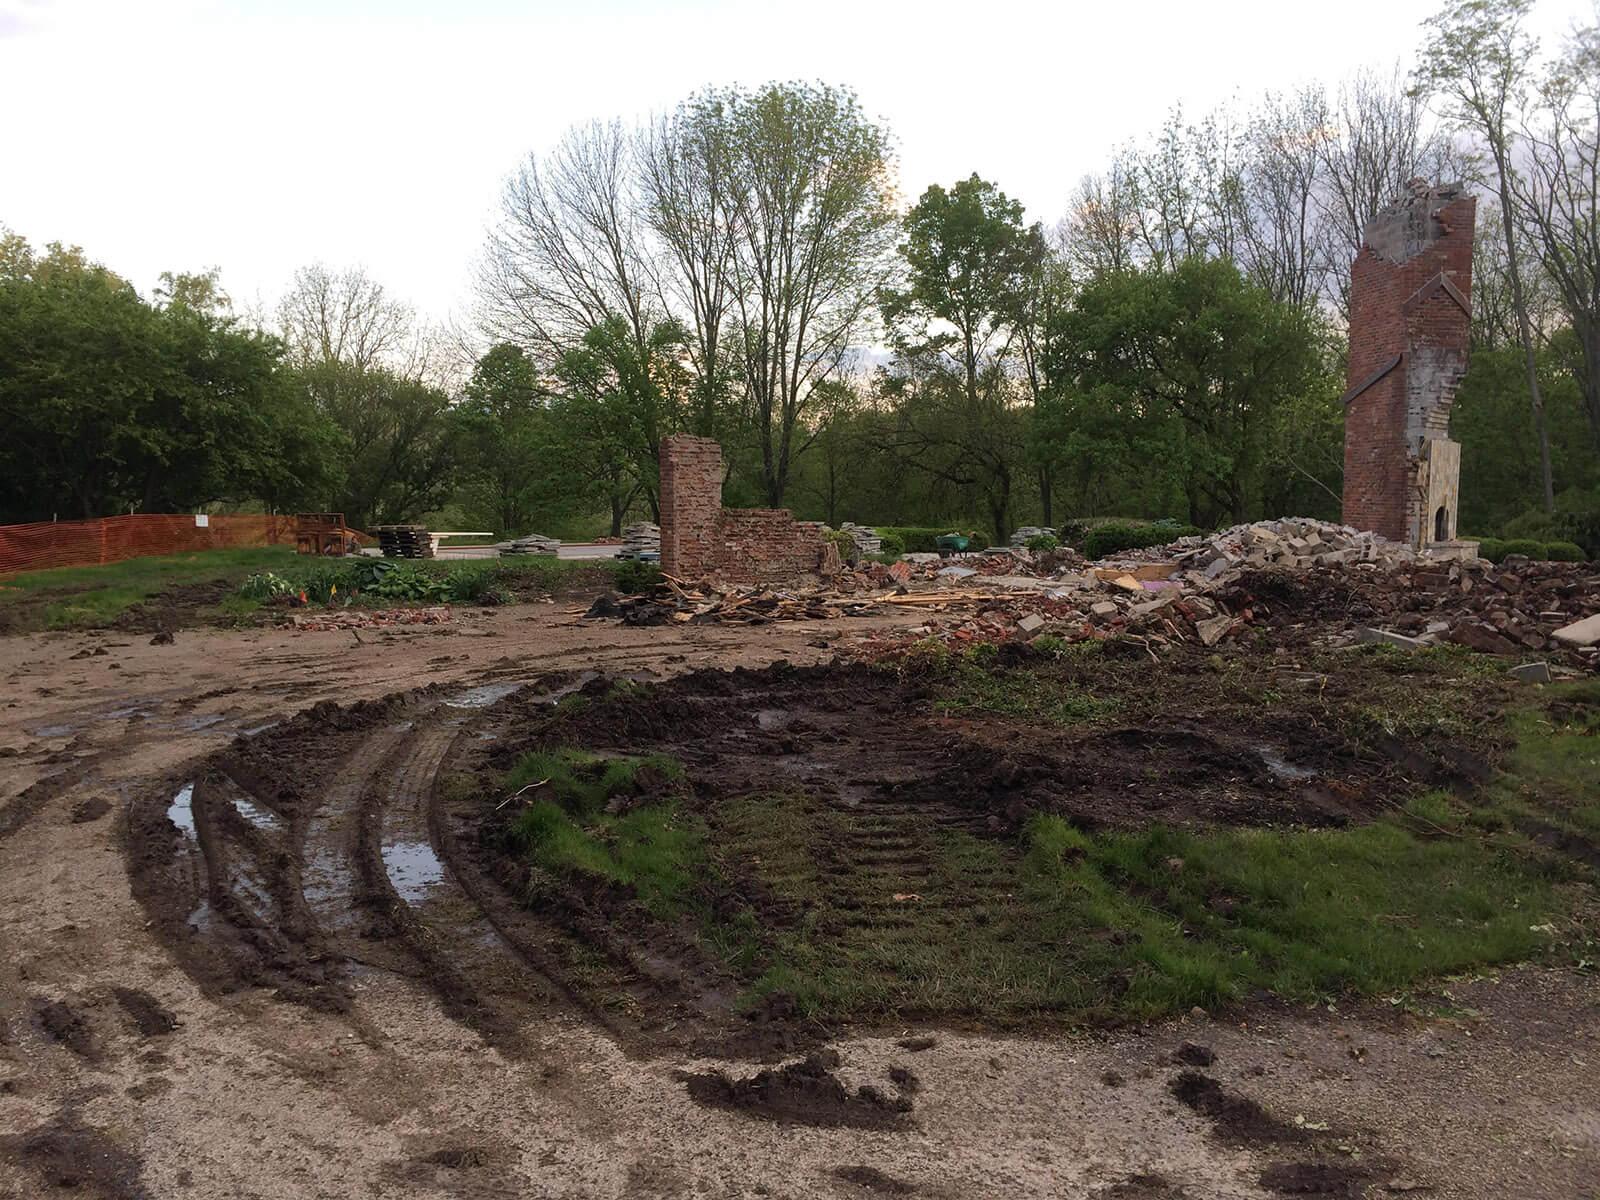 Ennis Custom Homes - Home Demolition - Carmel, Indiana Luxury Residential Construction - 116th st demo 4